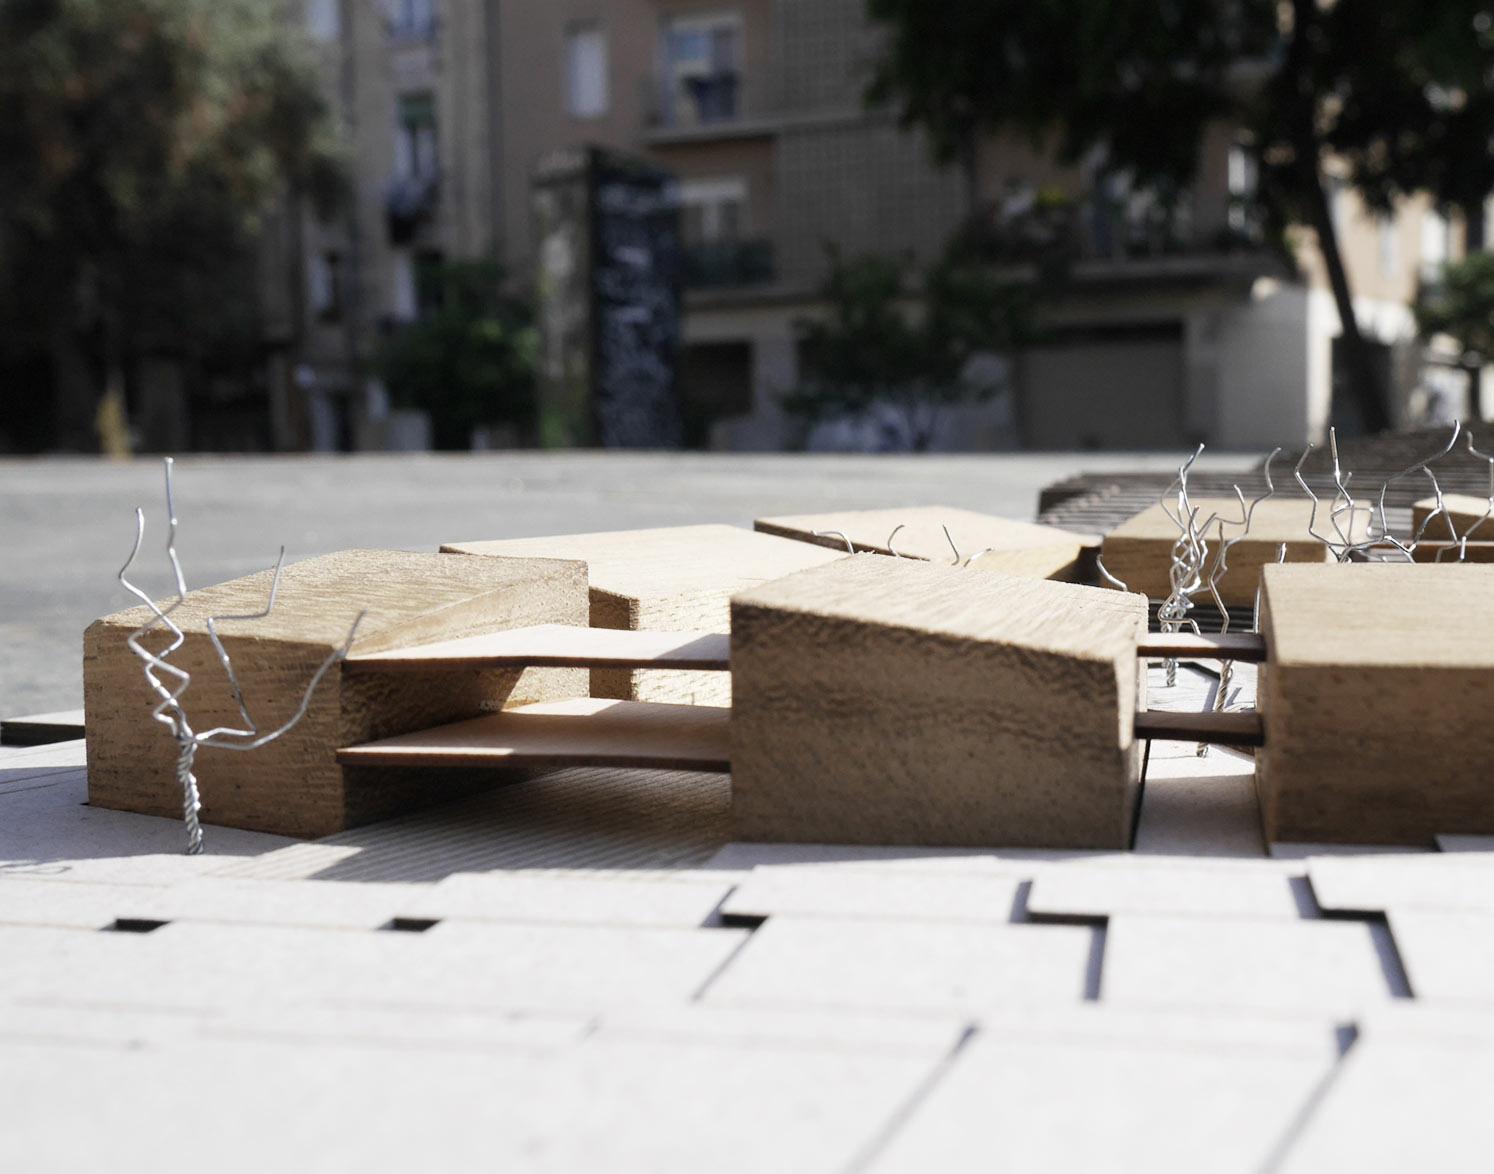 concurso centro de dia residencia selecionado sostenible nzeb maqueta